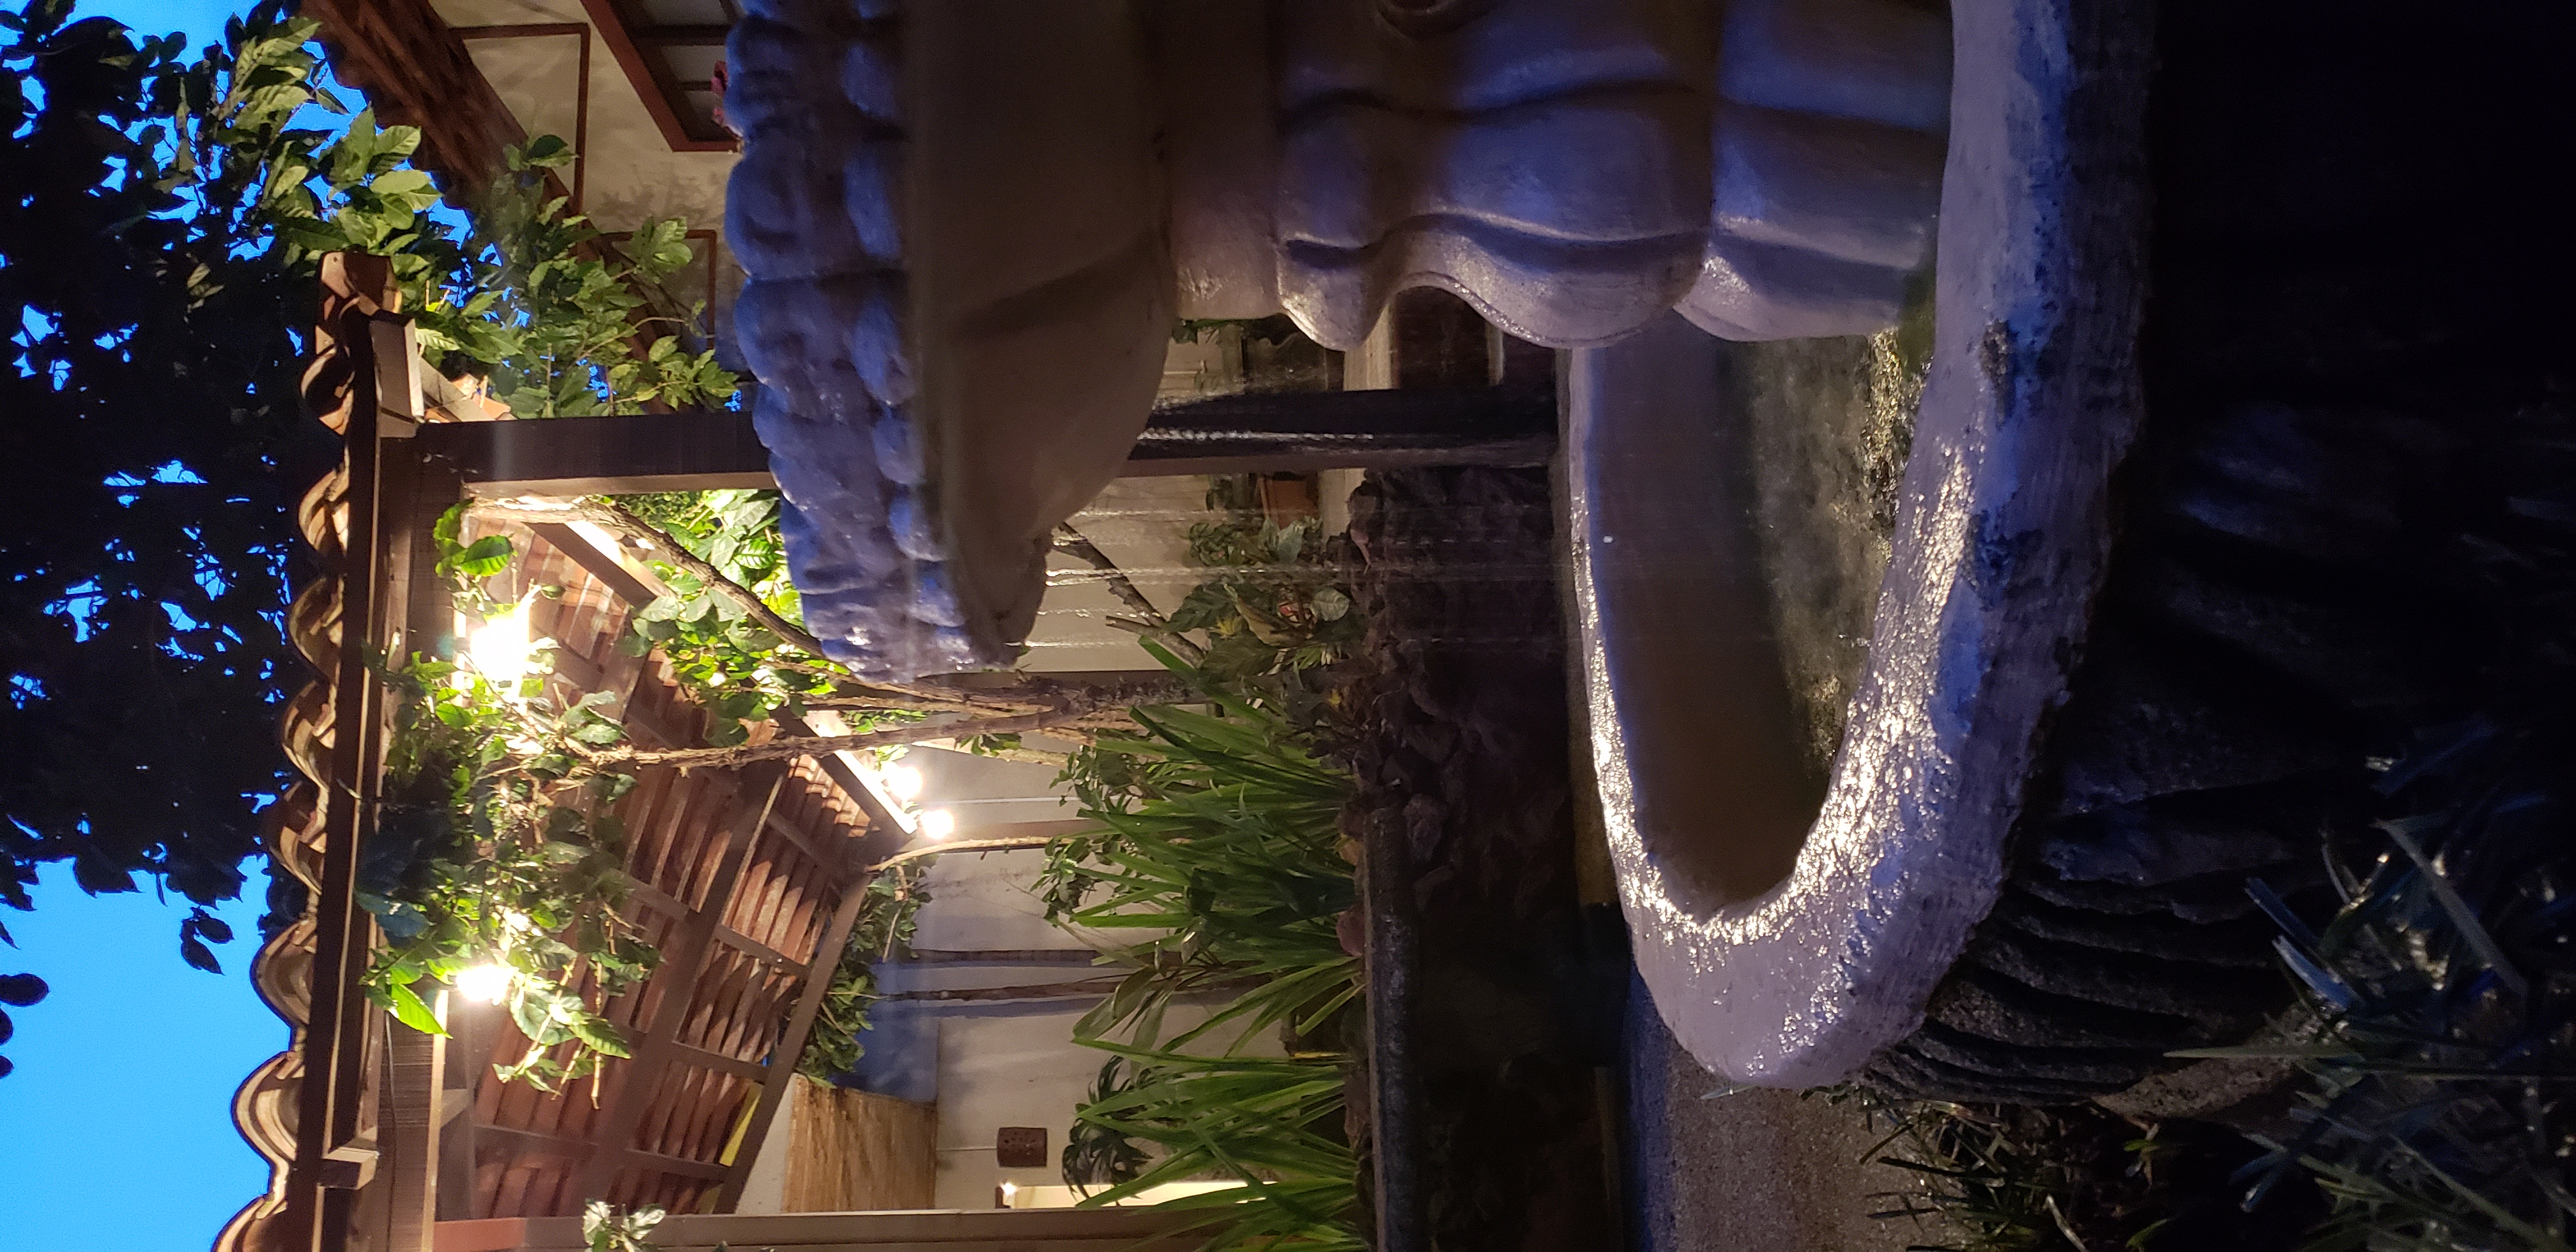 Courtyard Fountain at Night